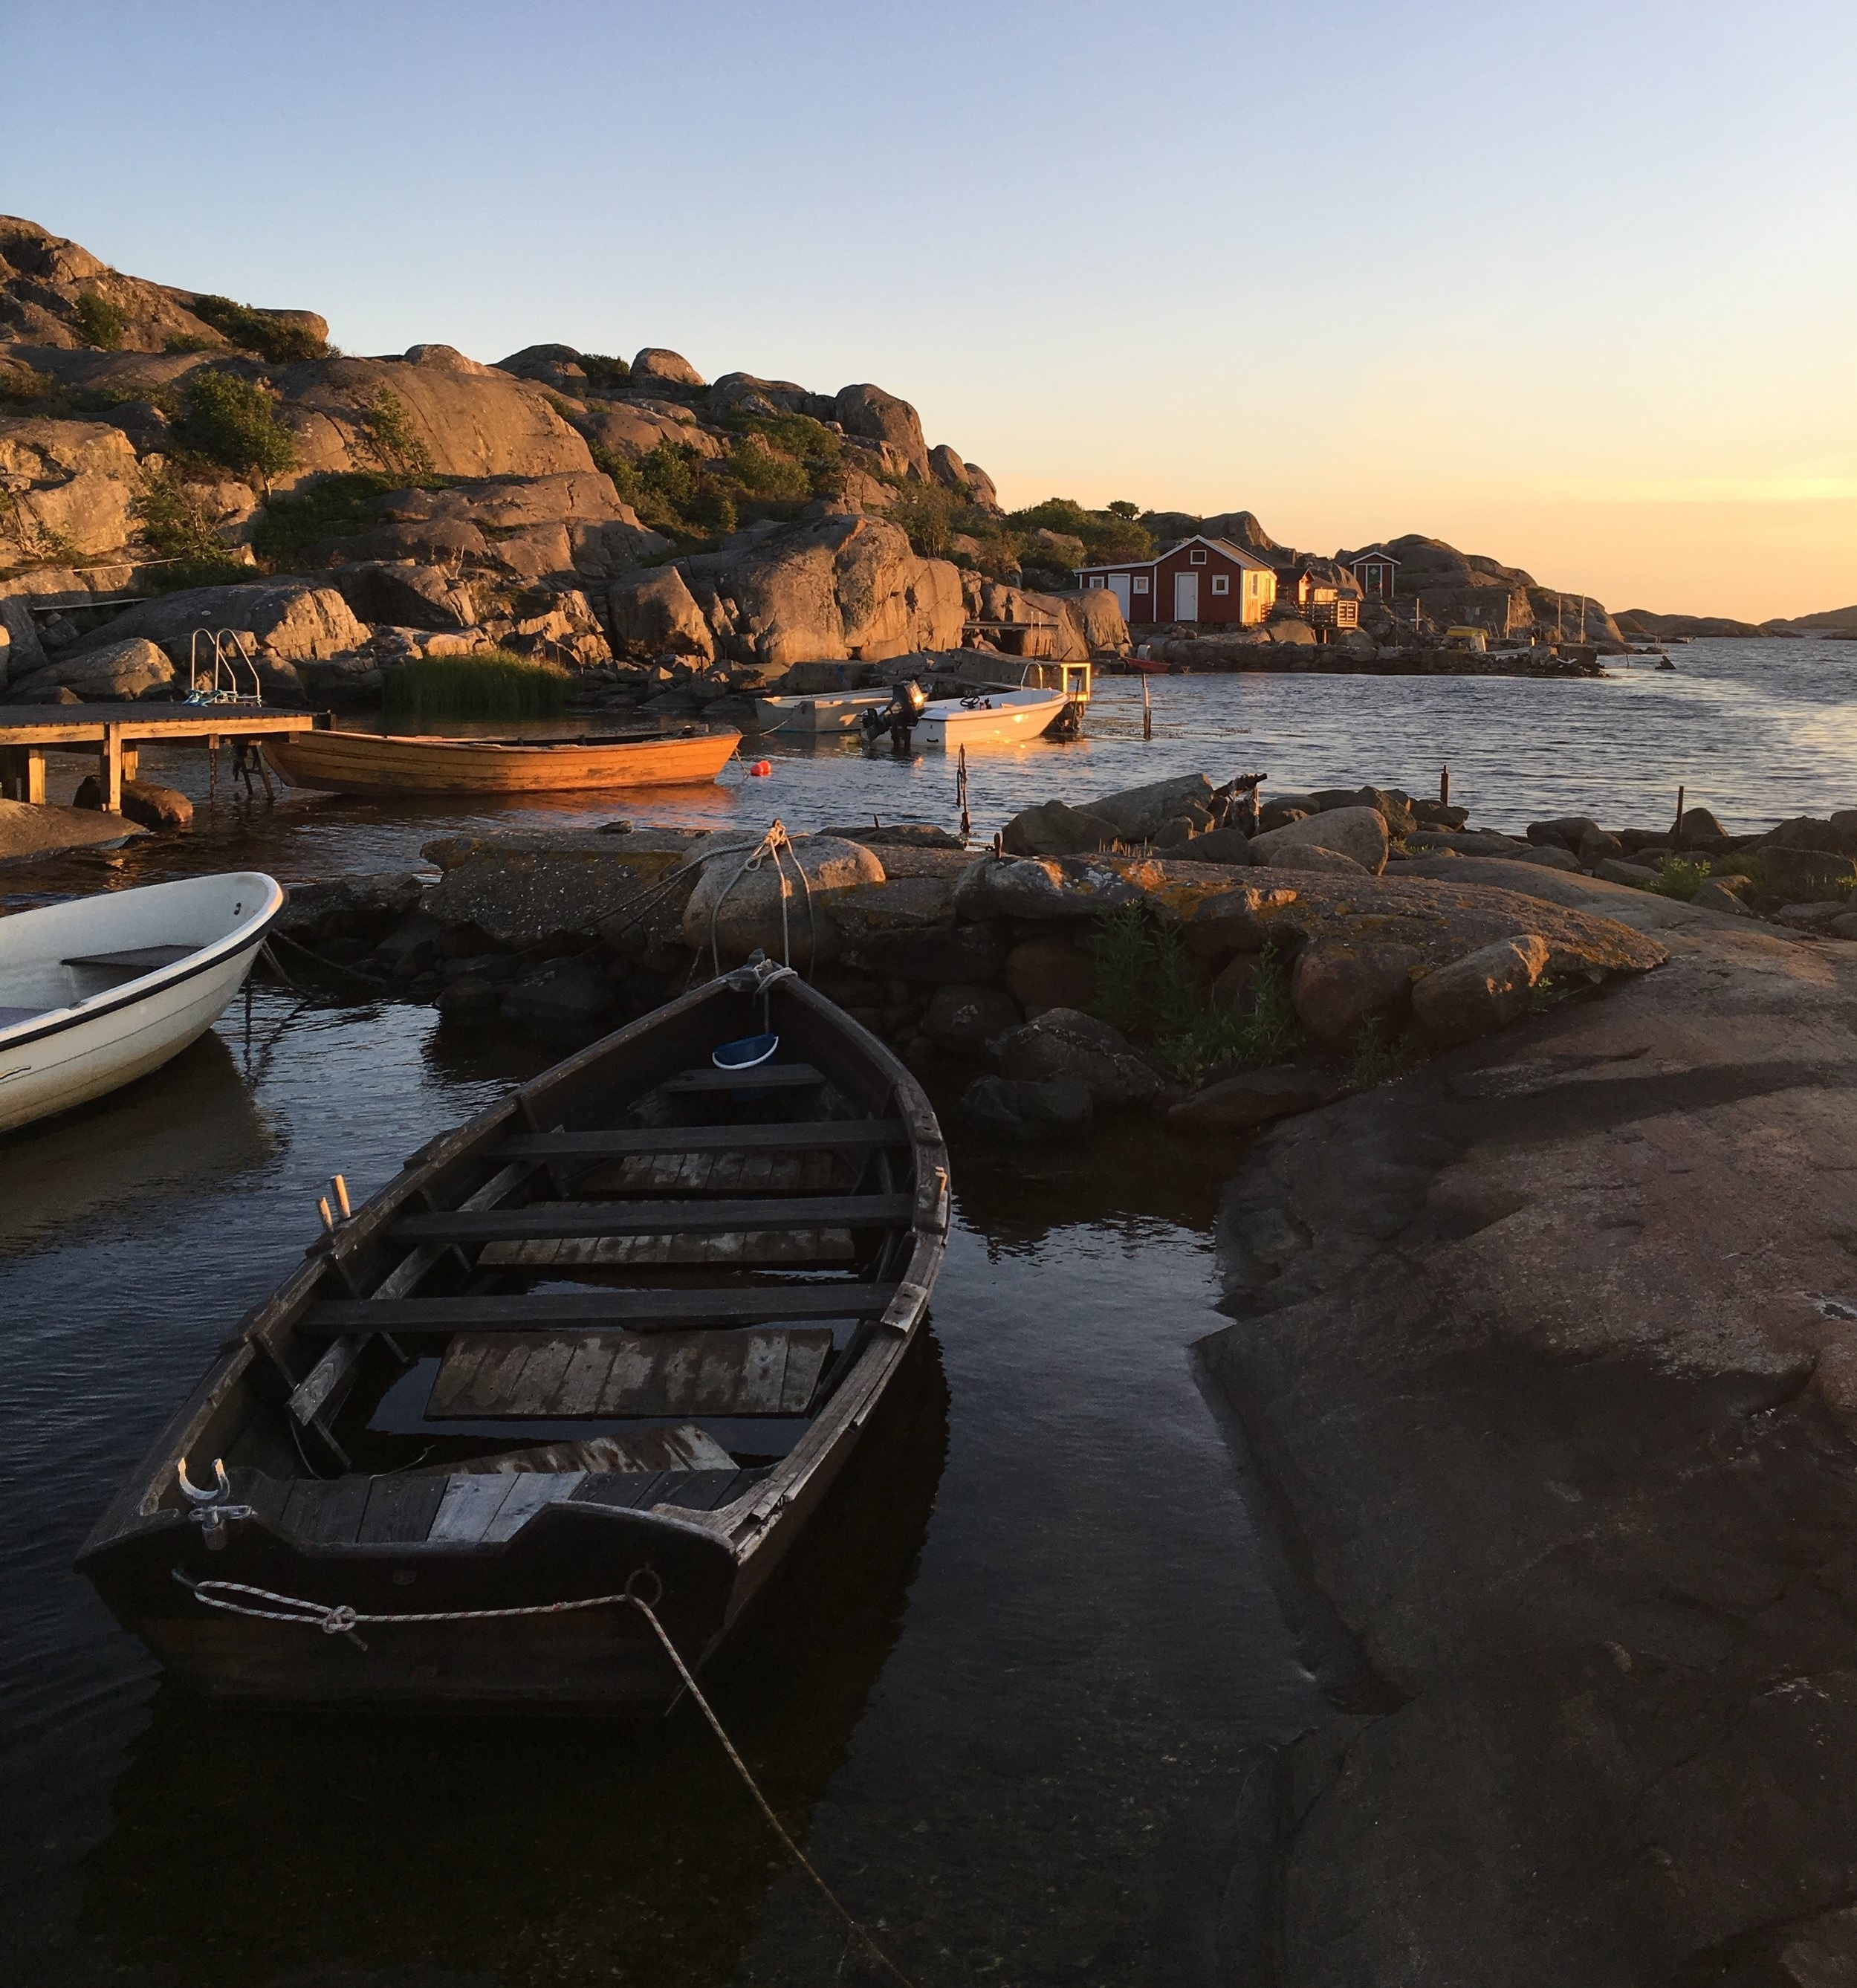 Sunset on Hono Island Sweden